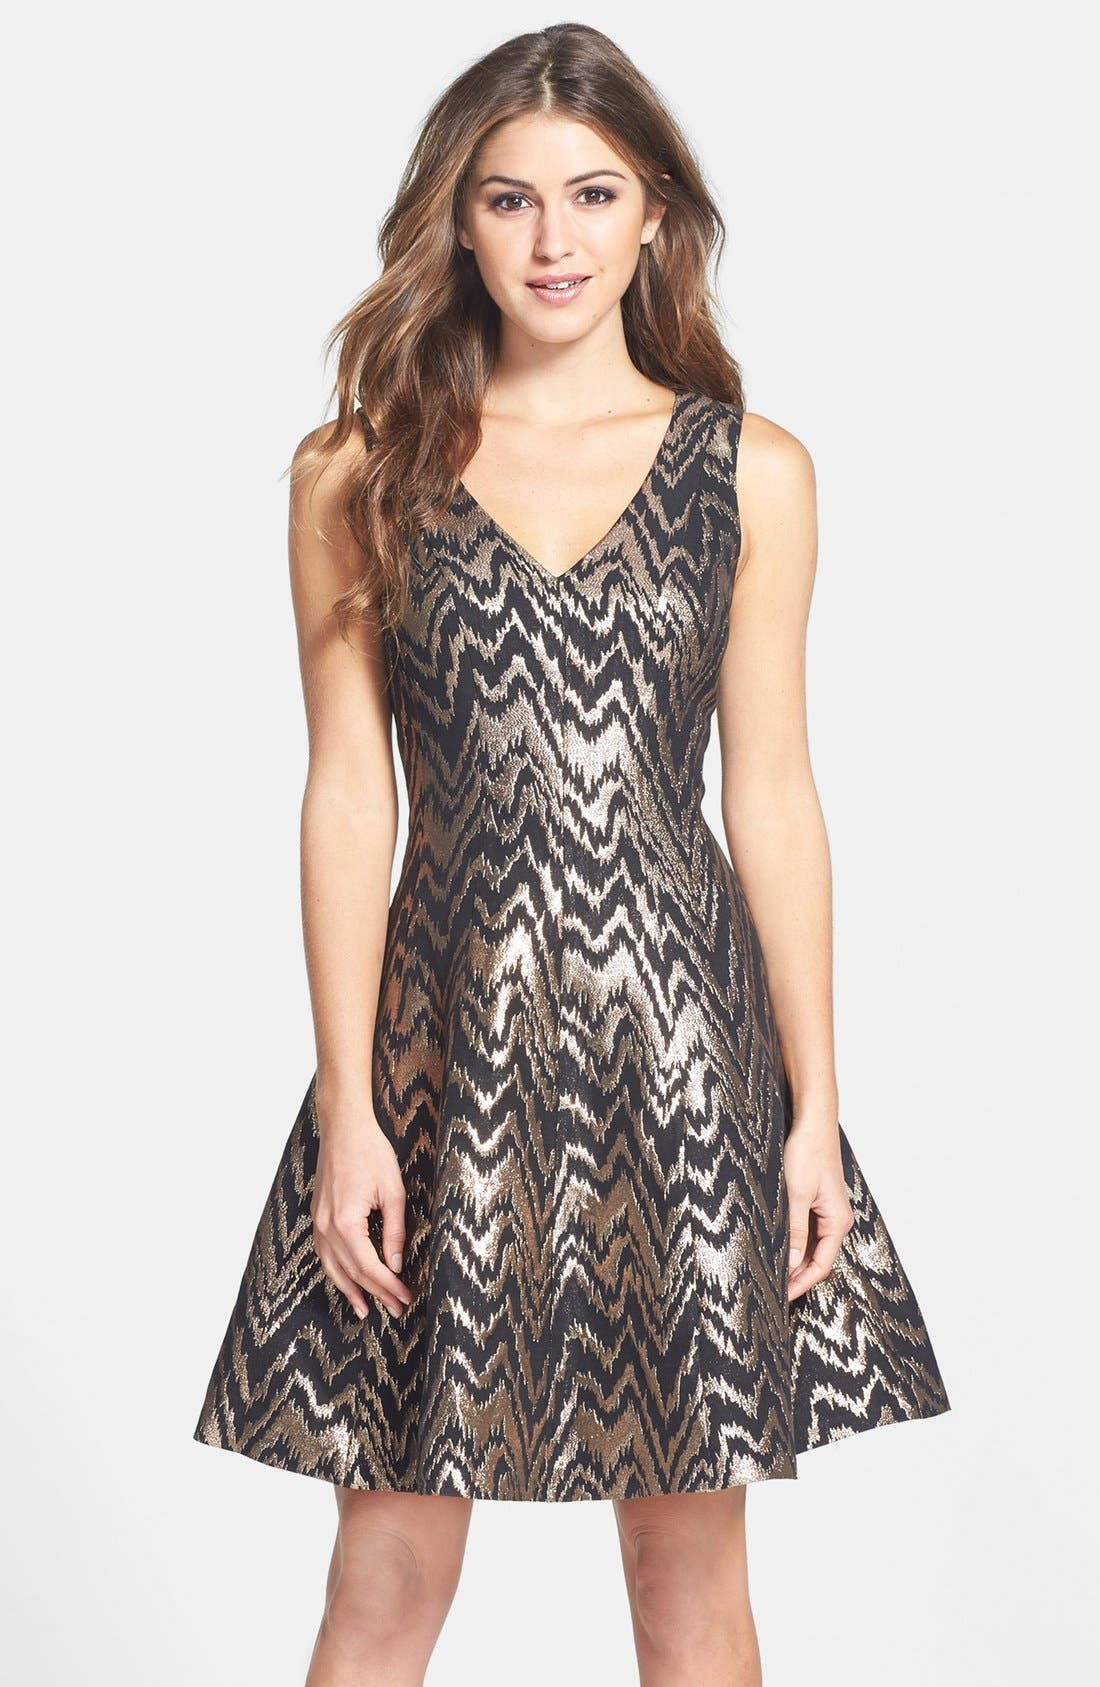 VINCE CAMUTO,                             Metallic Jacquard Fit & Flare Dress,                             Main thumbnail 1, color,                             226